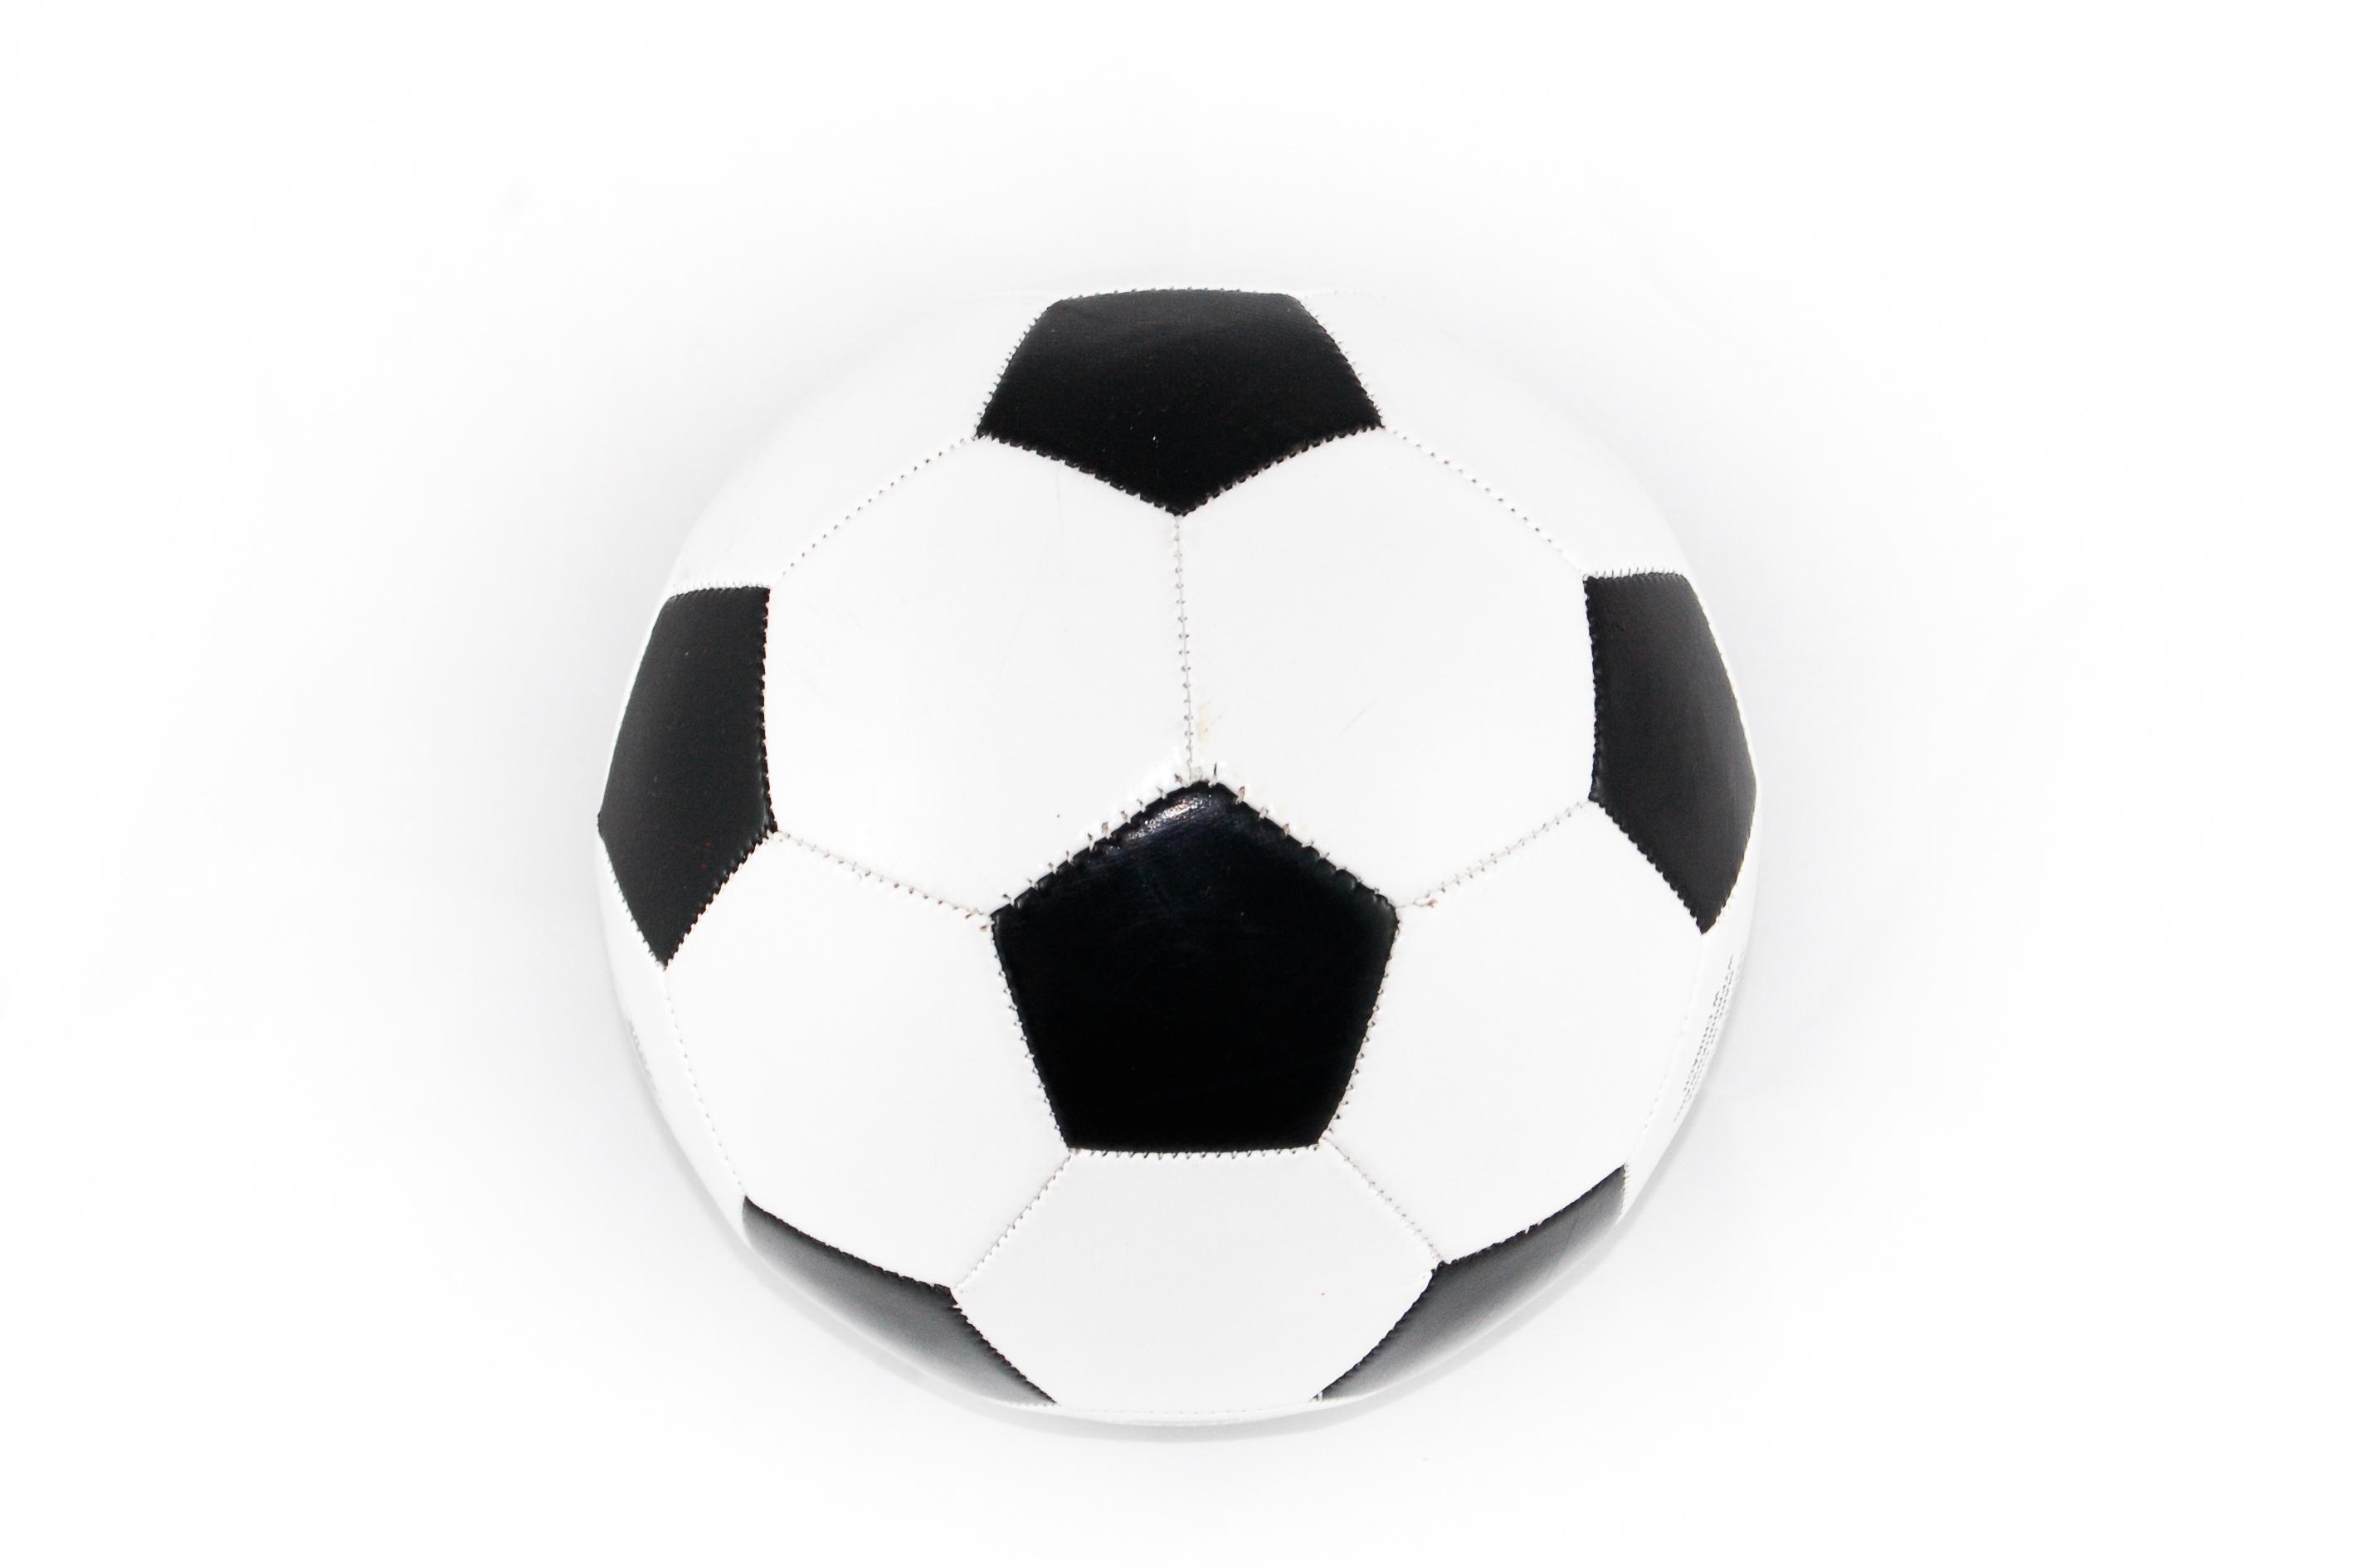 Fondos De Pantalla Fútbol Pelota Silueta Deporte: Fondos De Pantalla : Deporte, Fondo Blanco, Balón De